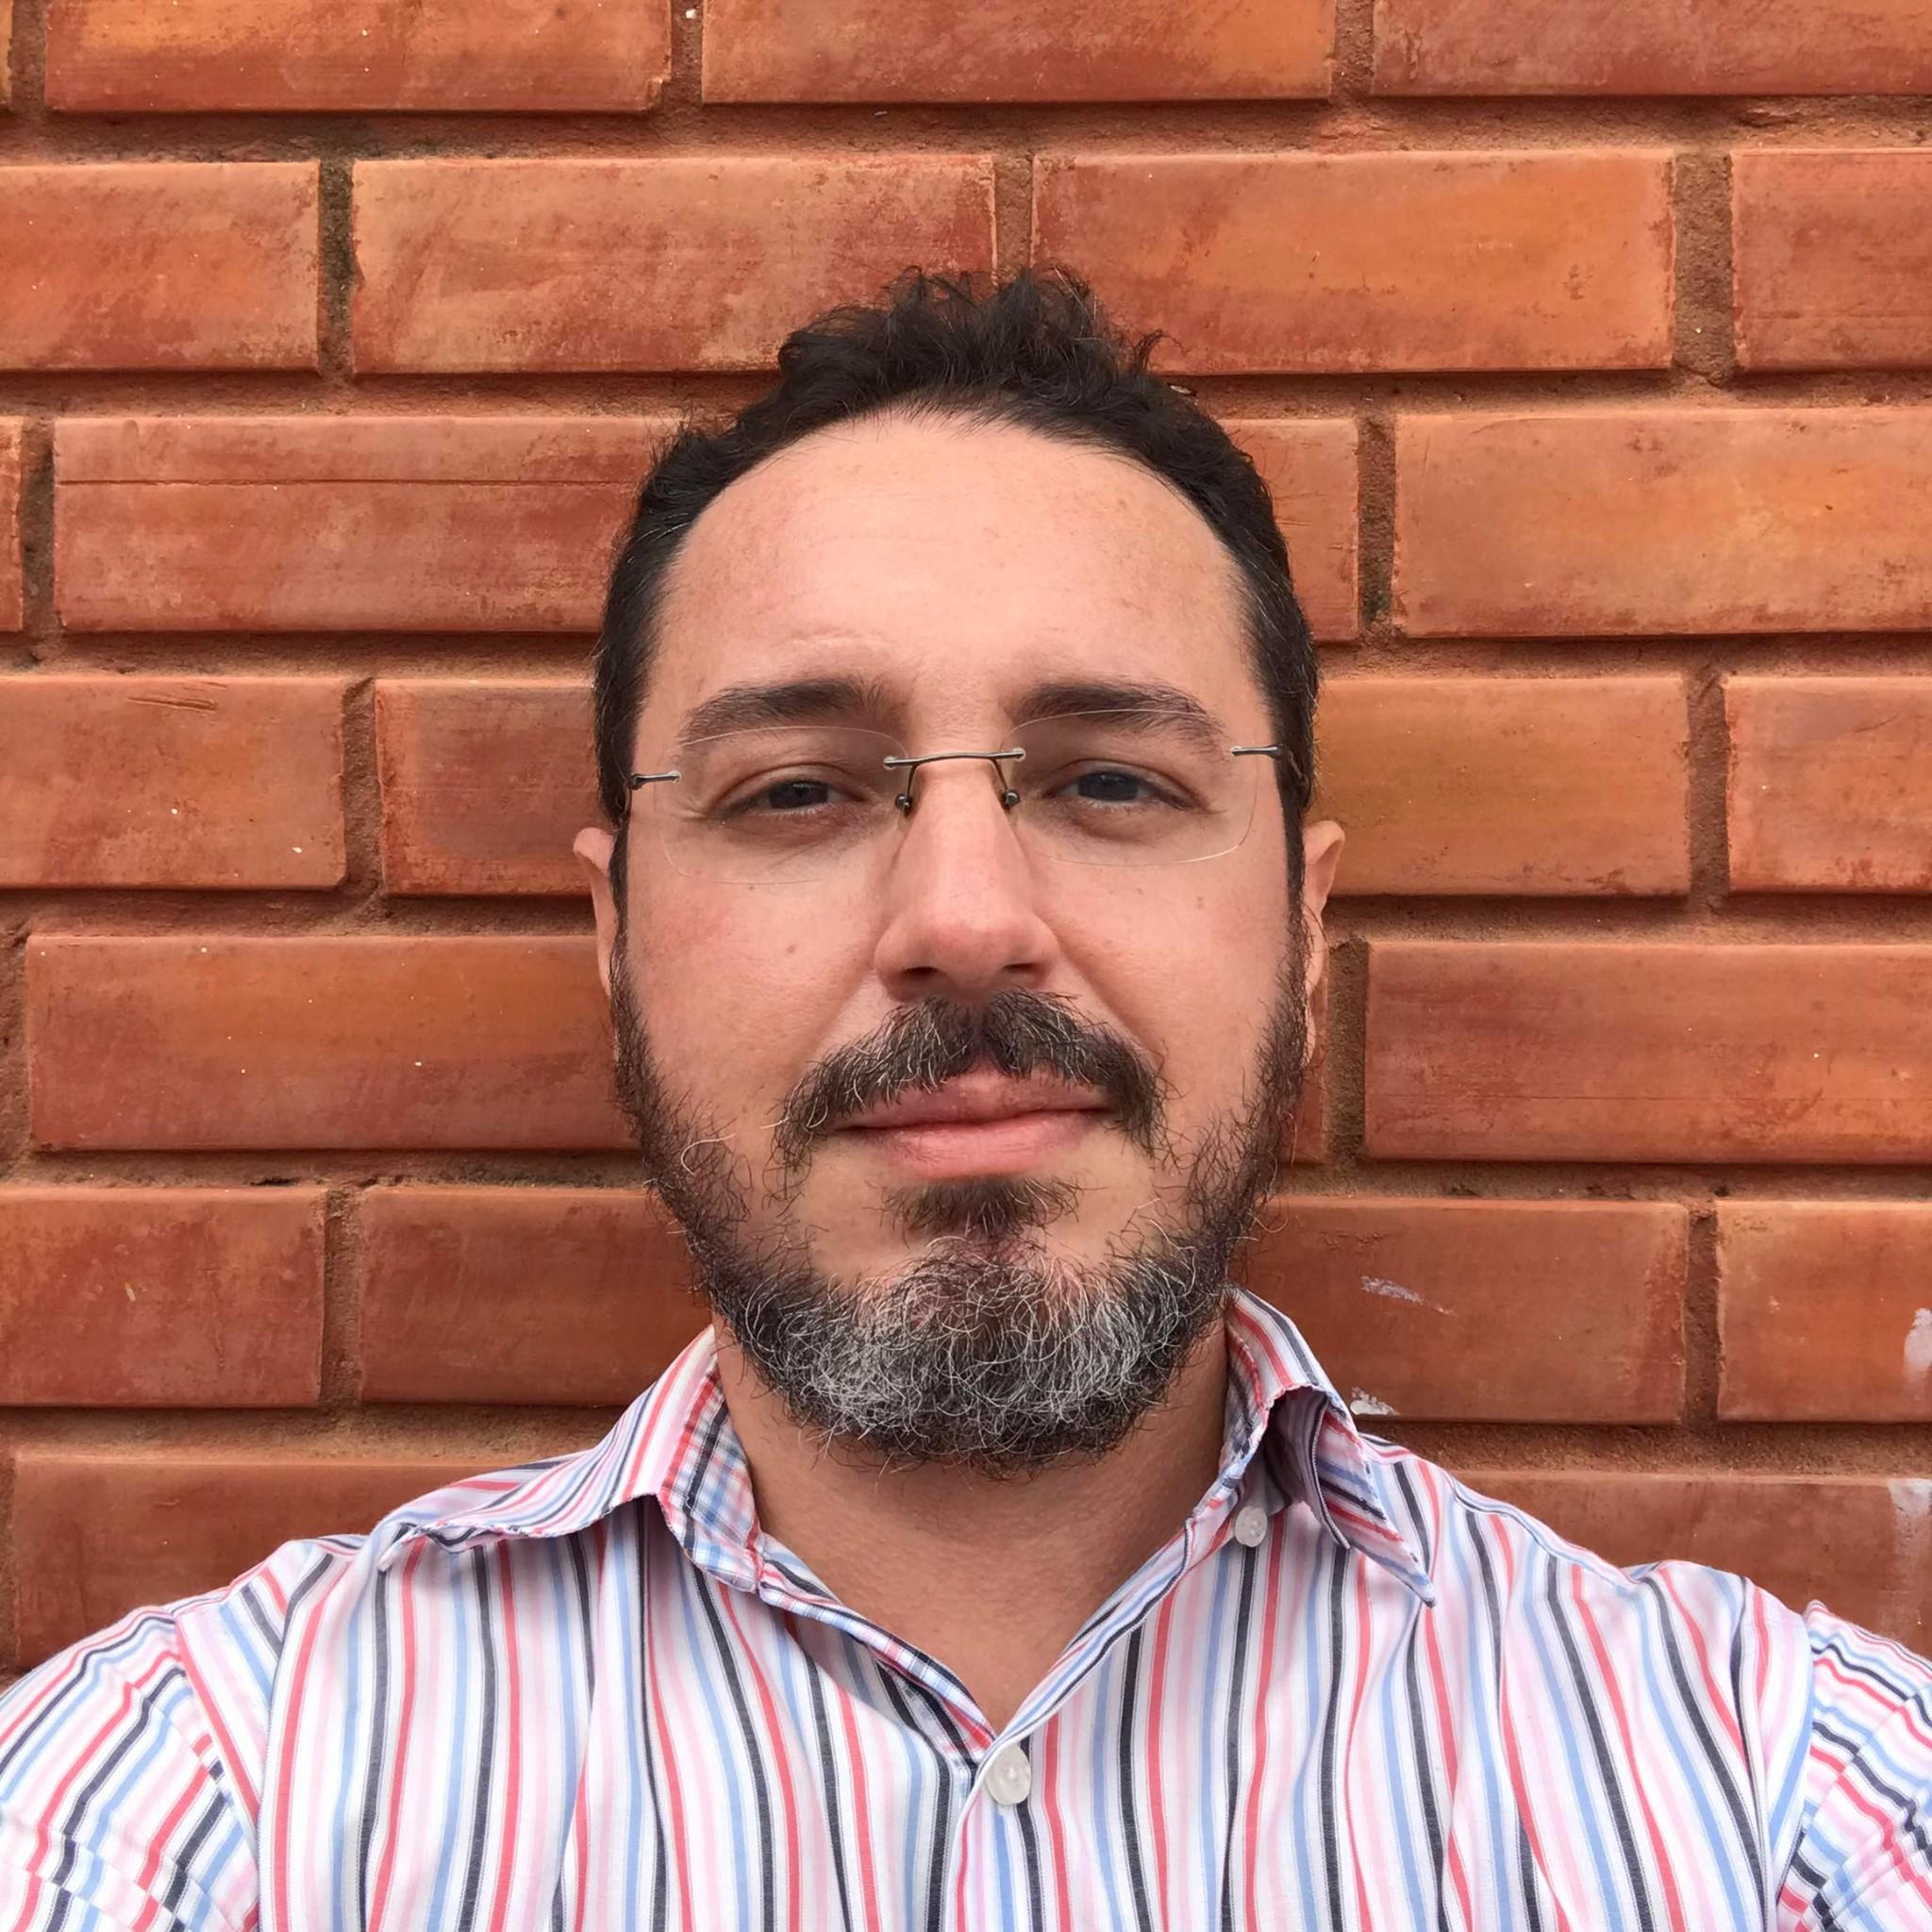 Retrato do jornalista Emmanuel Montenegro